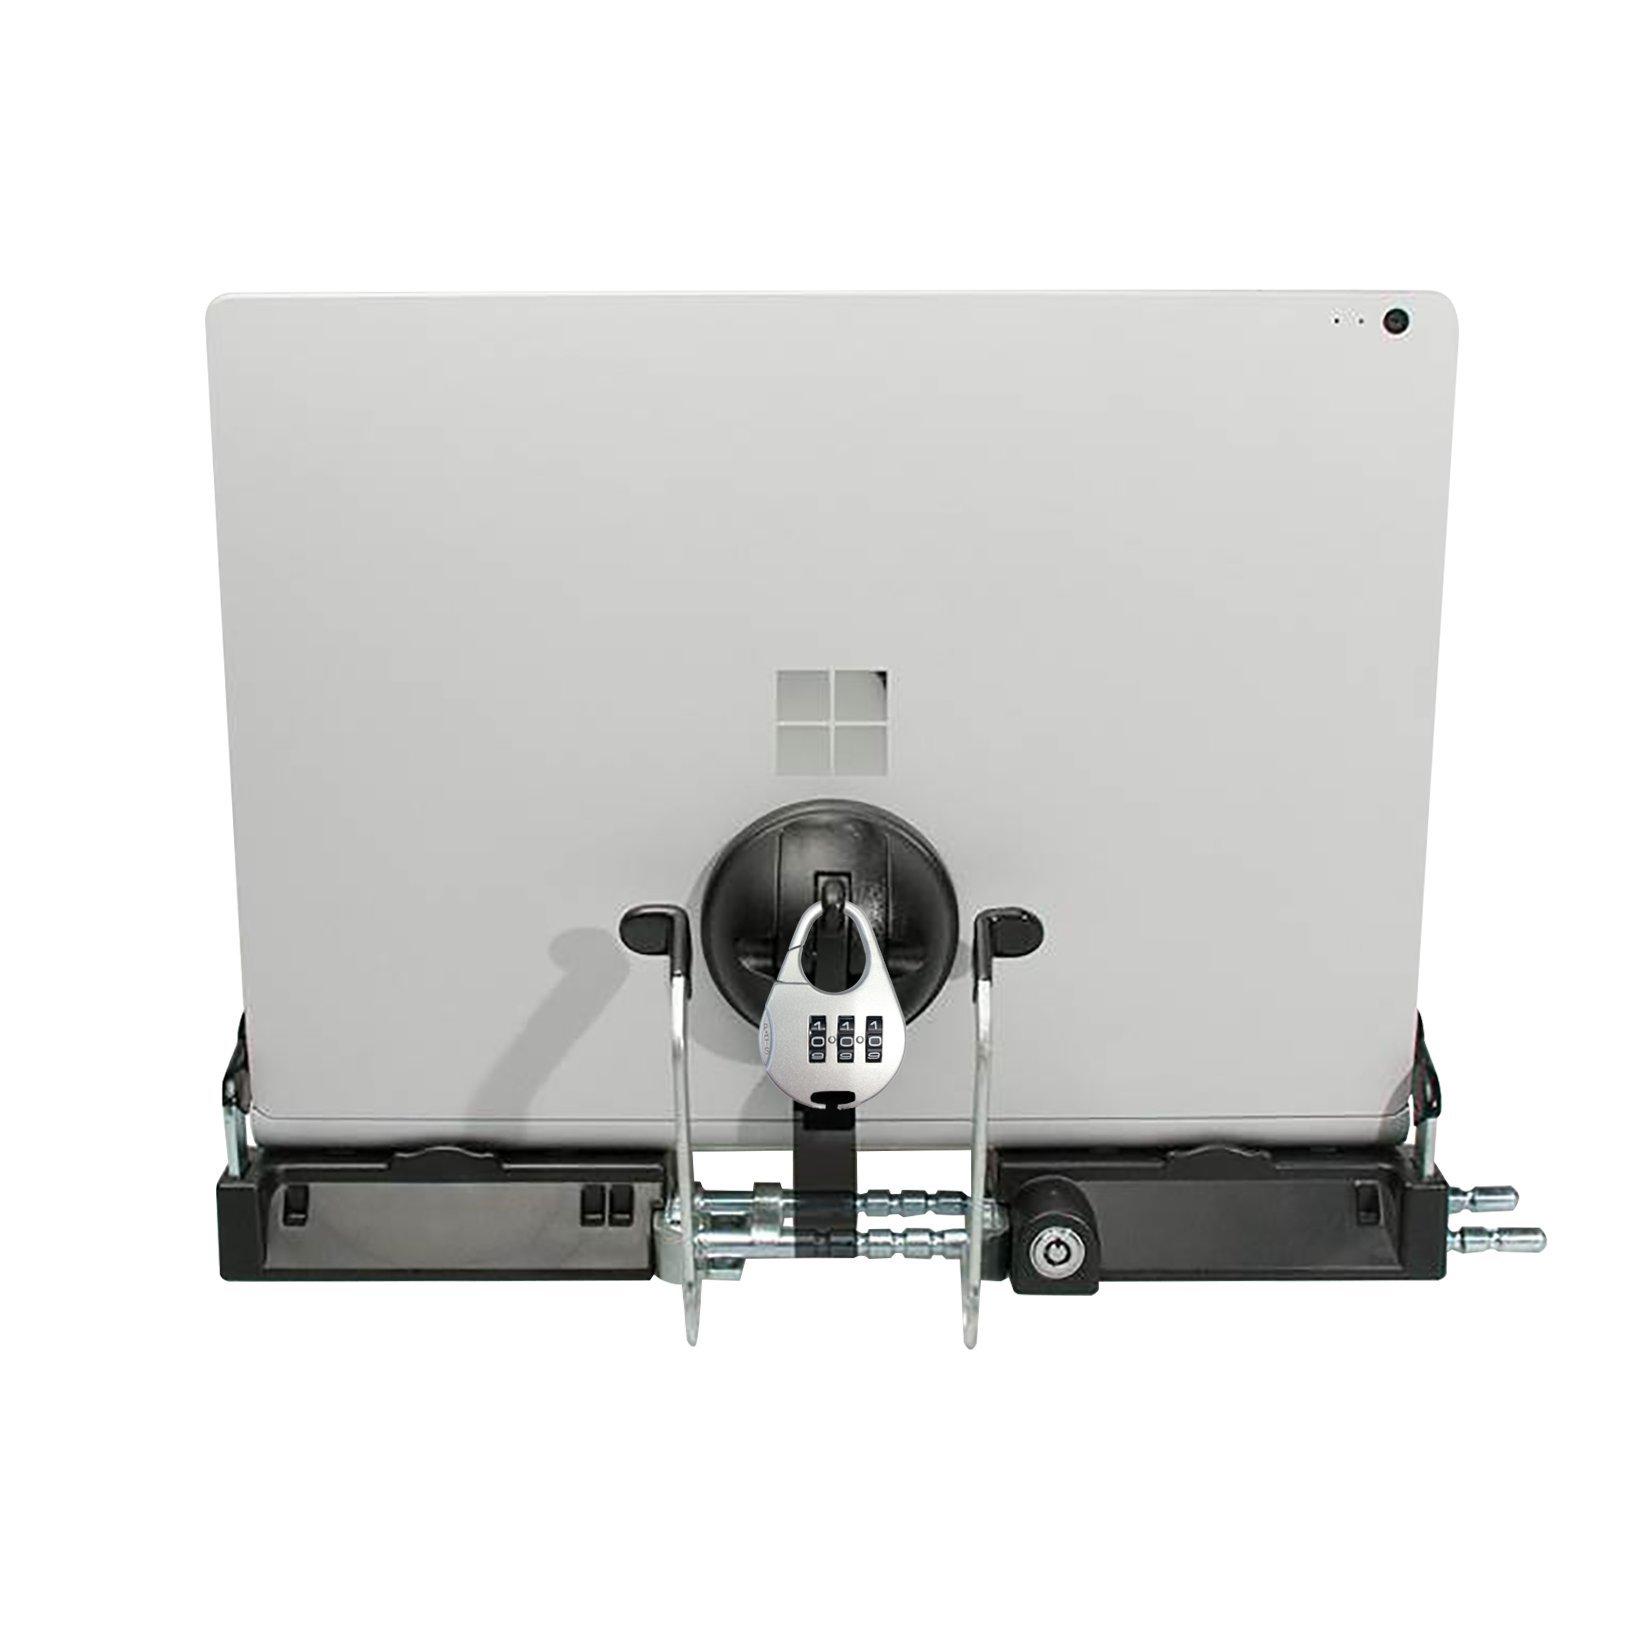 CTA Digital Heavy Duty Tri-Security Station for Tablet-Laptop Hybrids - PAD-SSLT by CTA Digital (Image #3)